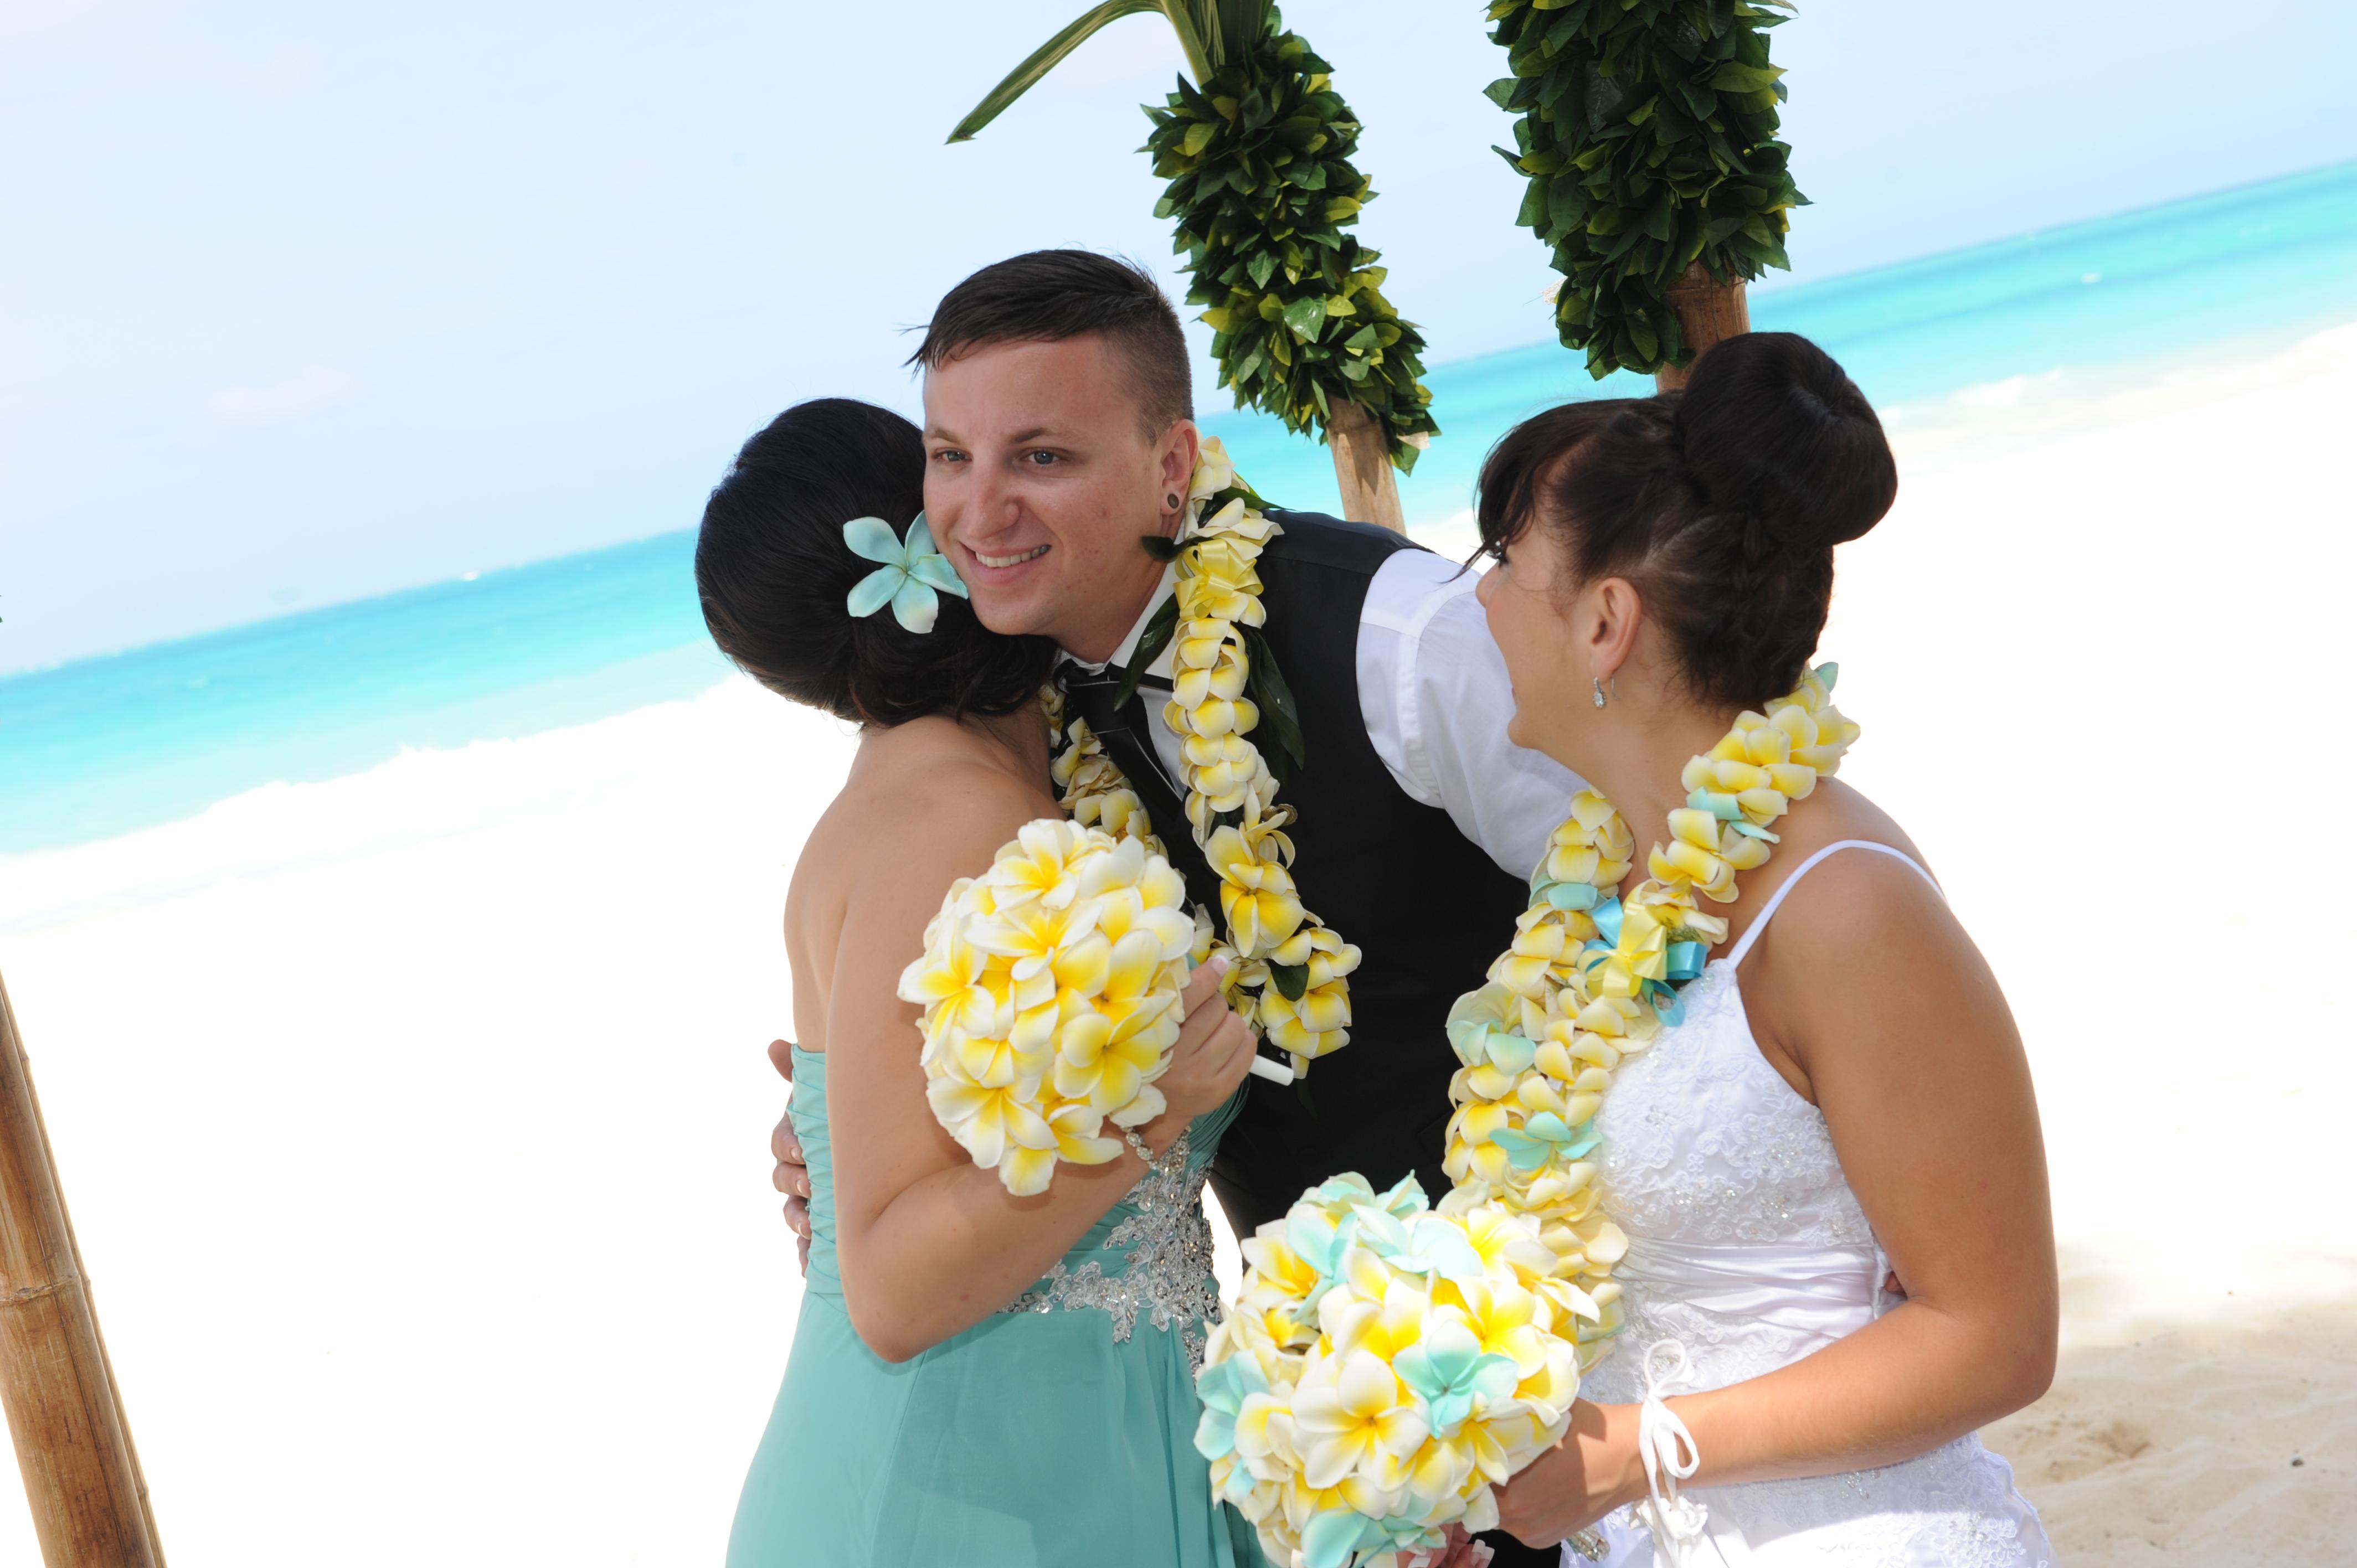 Alohaislandweddings.com- Wedding Picture in Hawaii-4